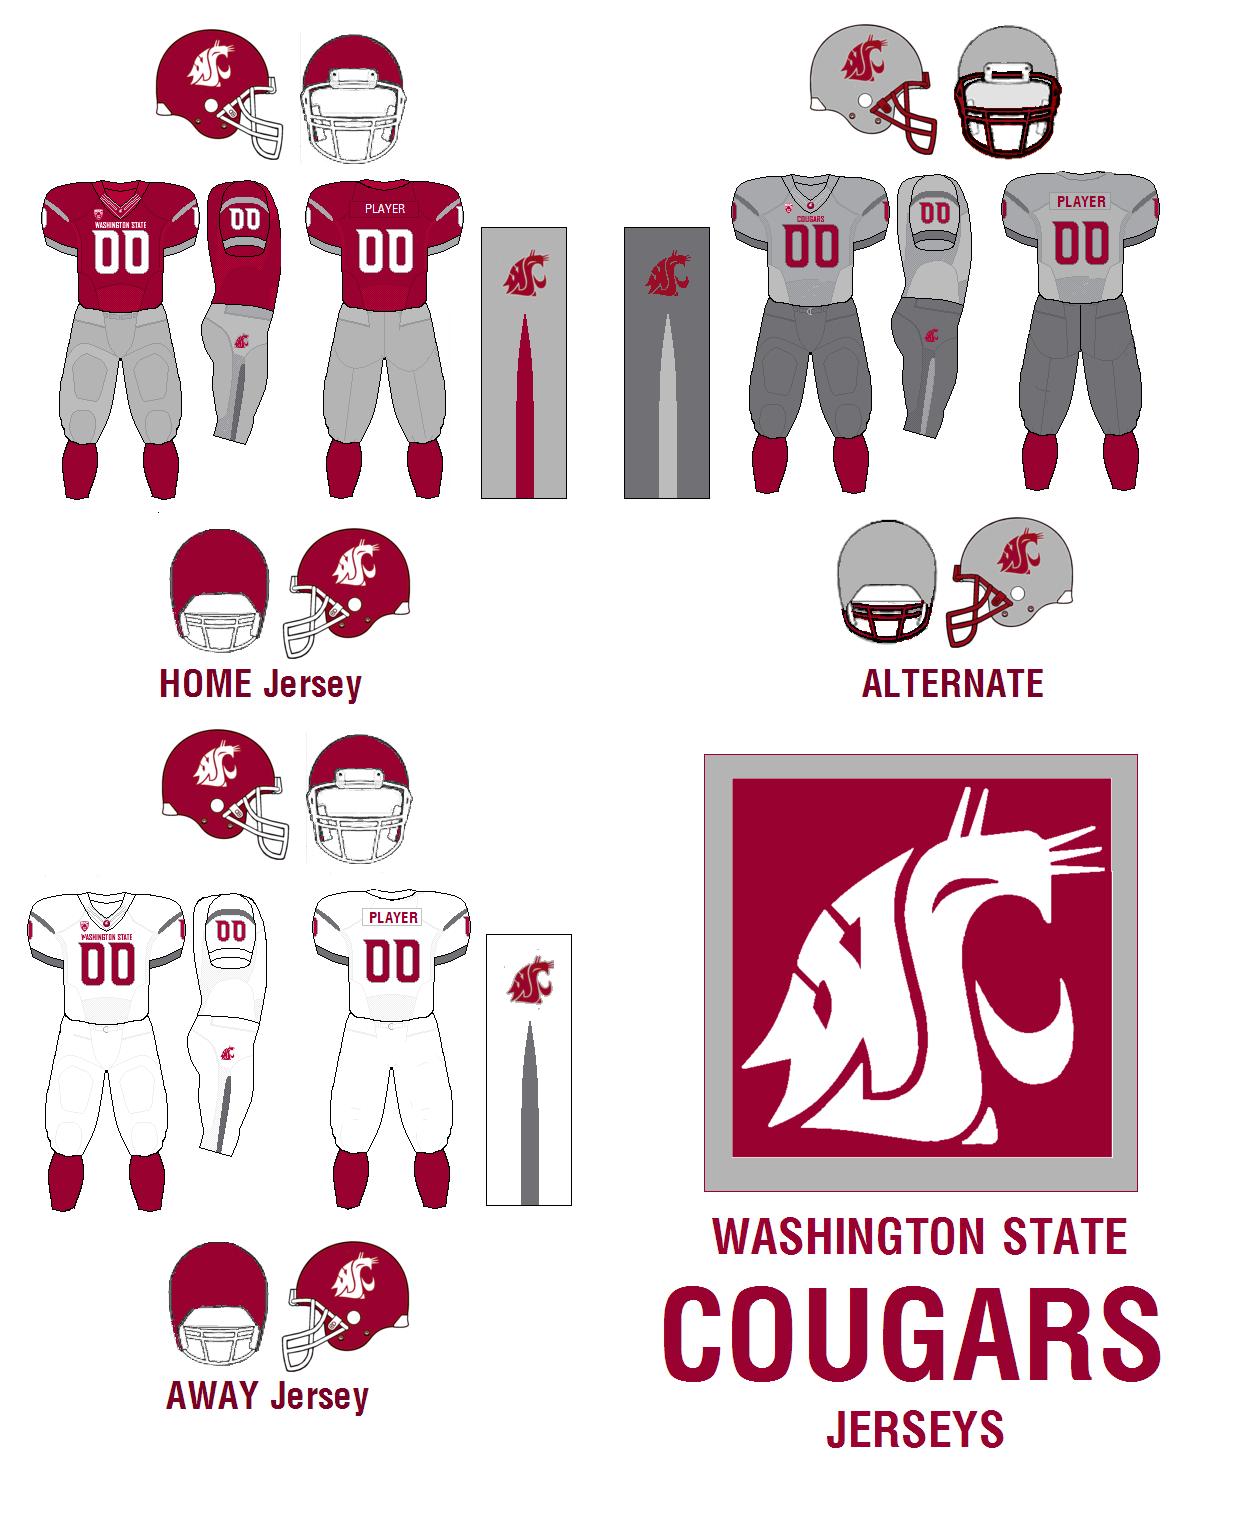 new concept 608b8 428c5 Washington State Cougars   American Football Wiki   FANDOM ...